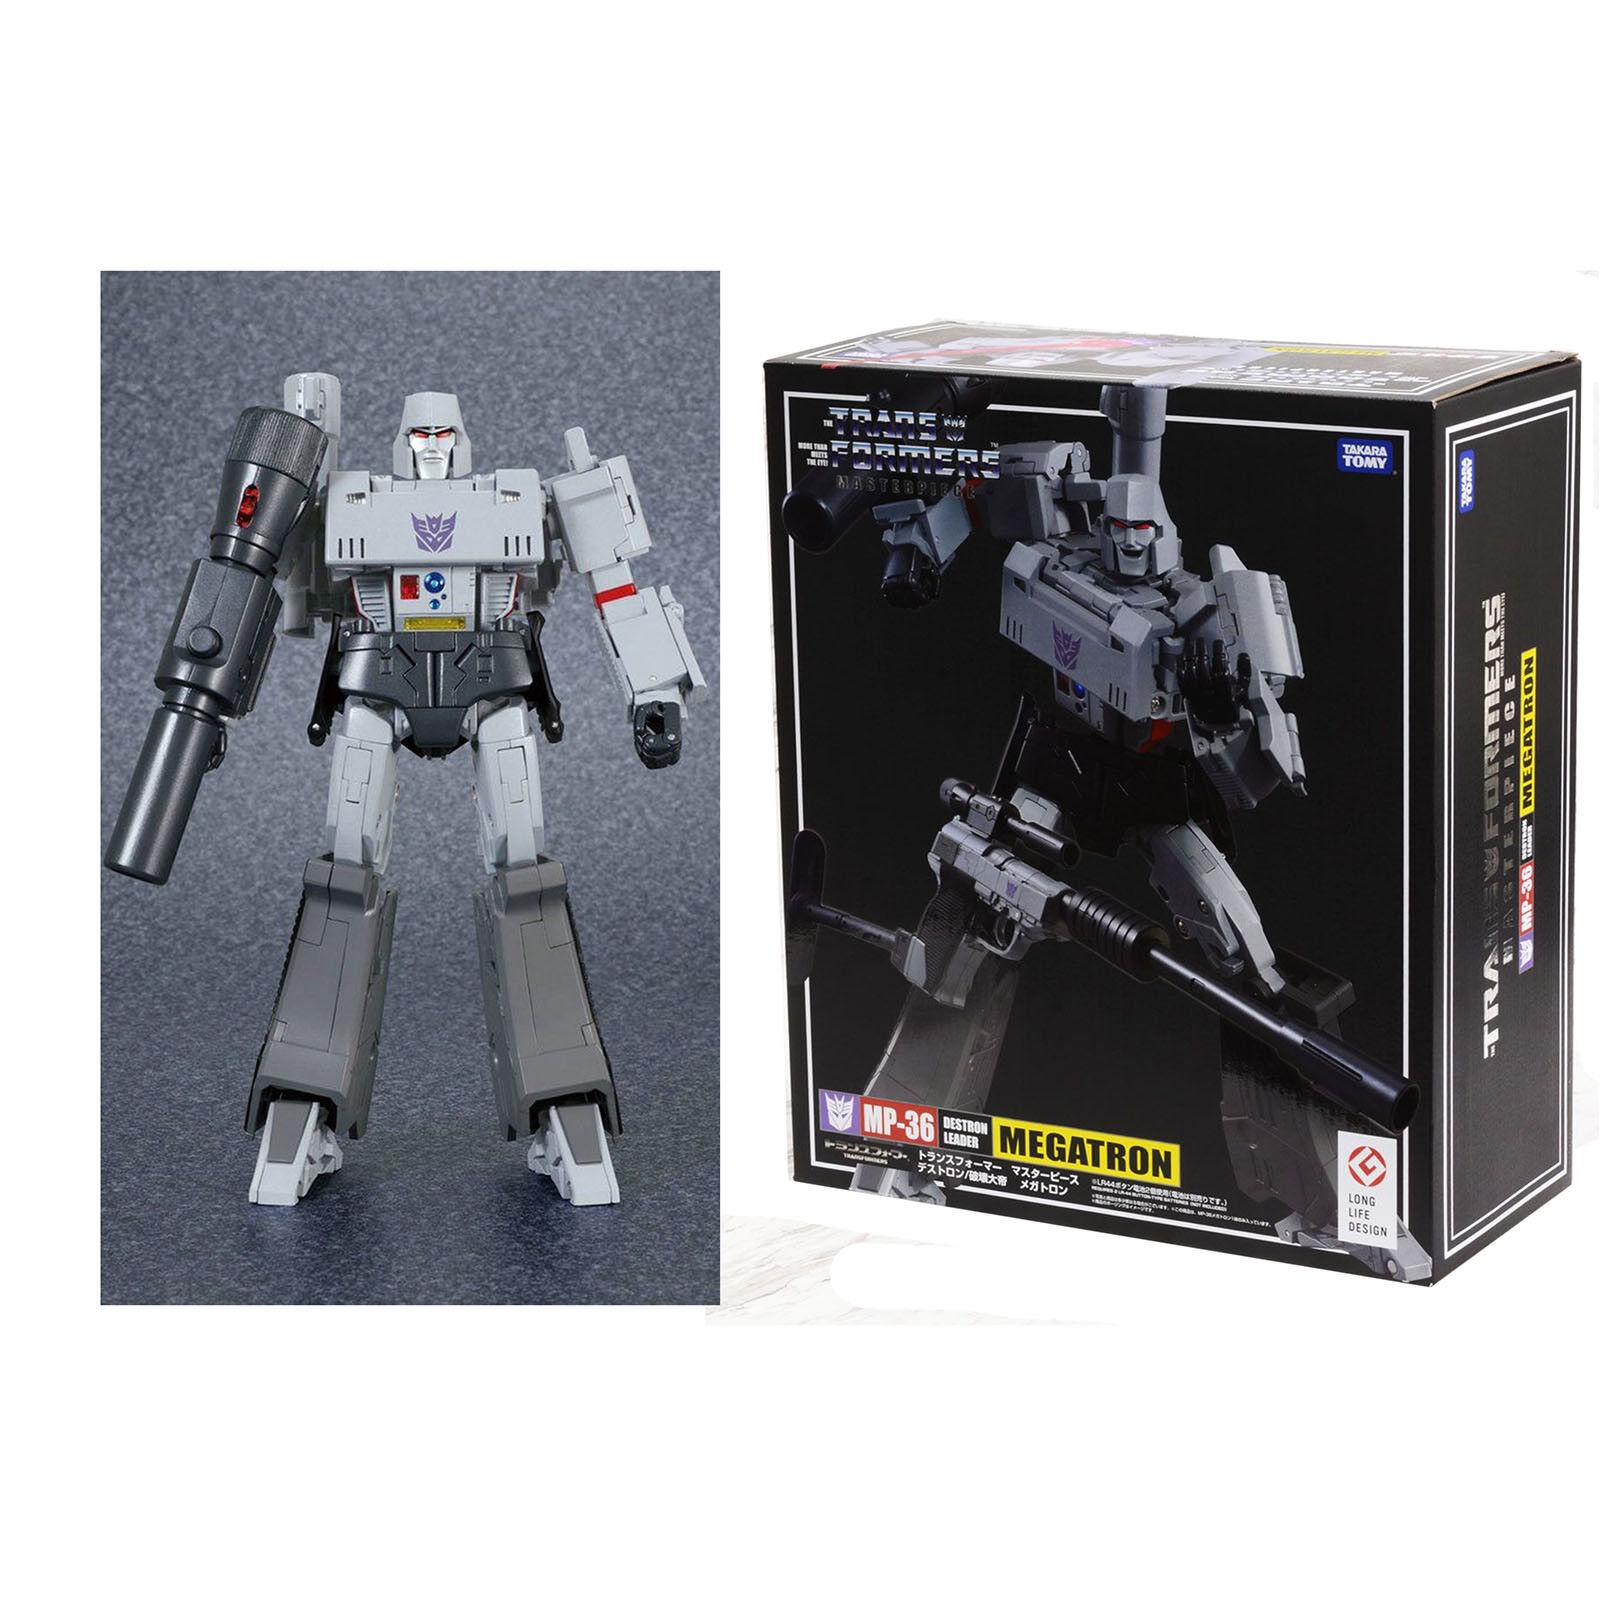 Transformer Megatron MP-36 Masterpiece Destron LeaderActionFigureSpielzeug